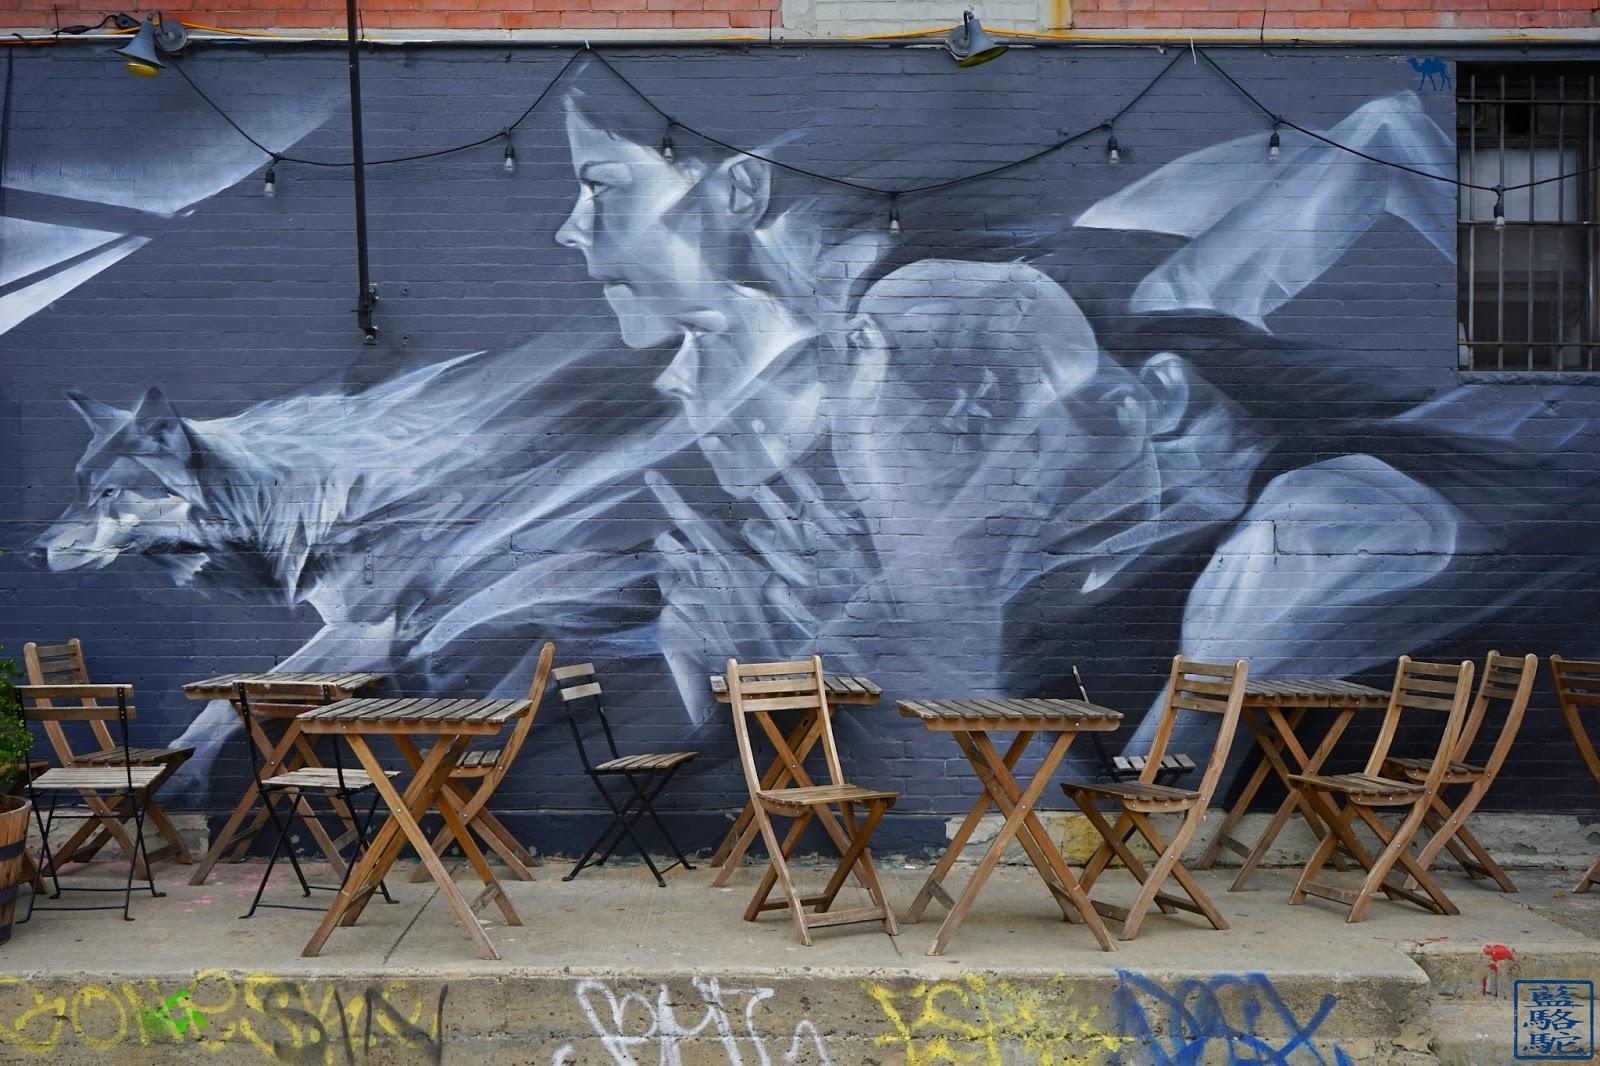 Le Chameau Bleu - Street art Loup - Bushwick - Brooklyn promenade dans New York